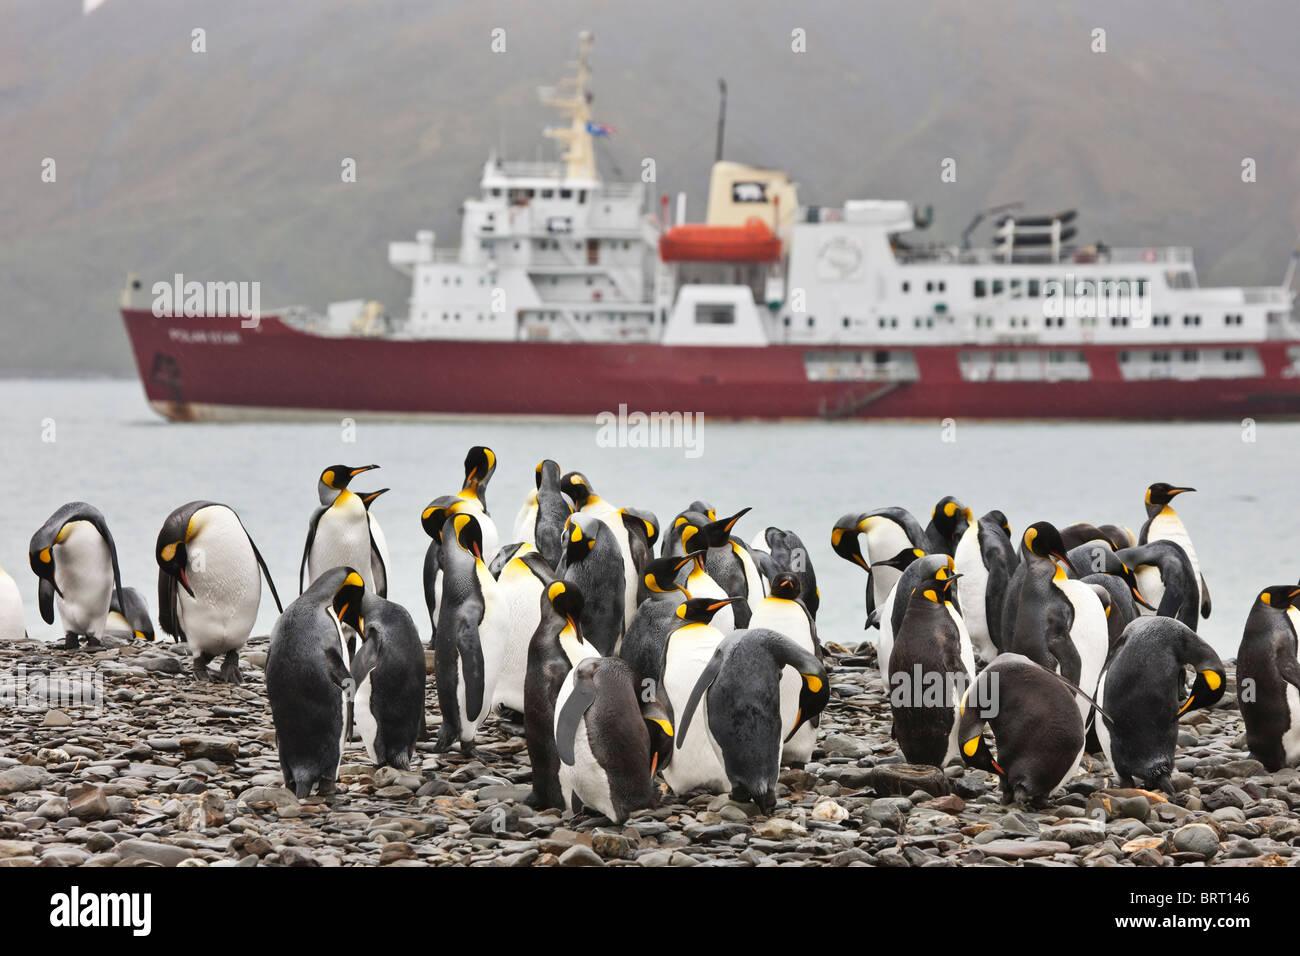 King penguins, M/V Polar Star, Fortuna Bay, South Georgia Island Stock Photo